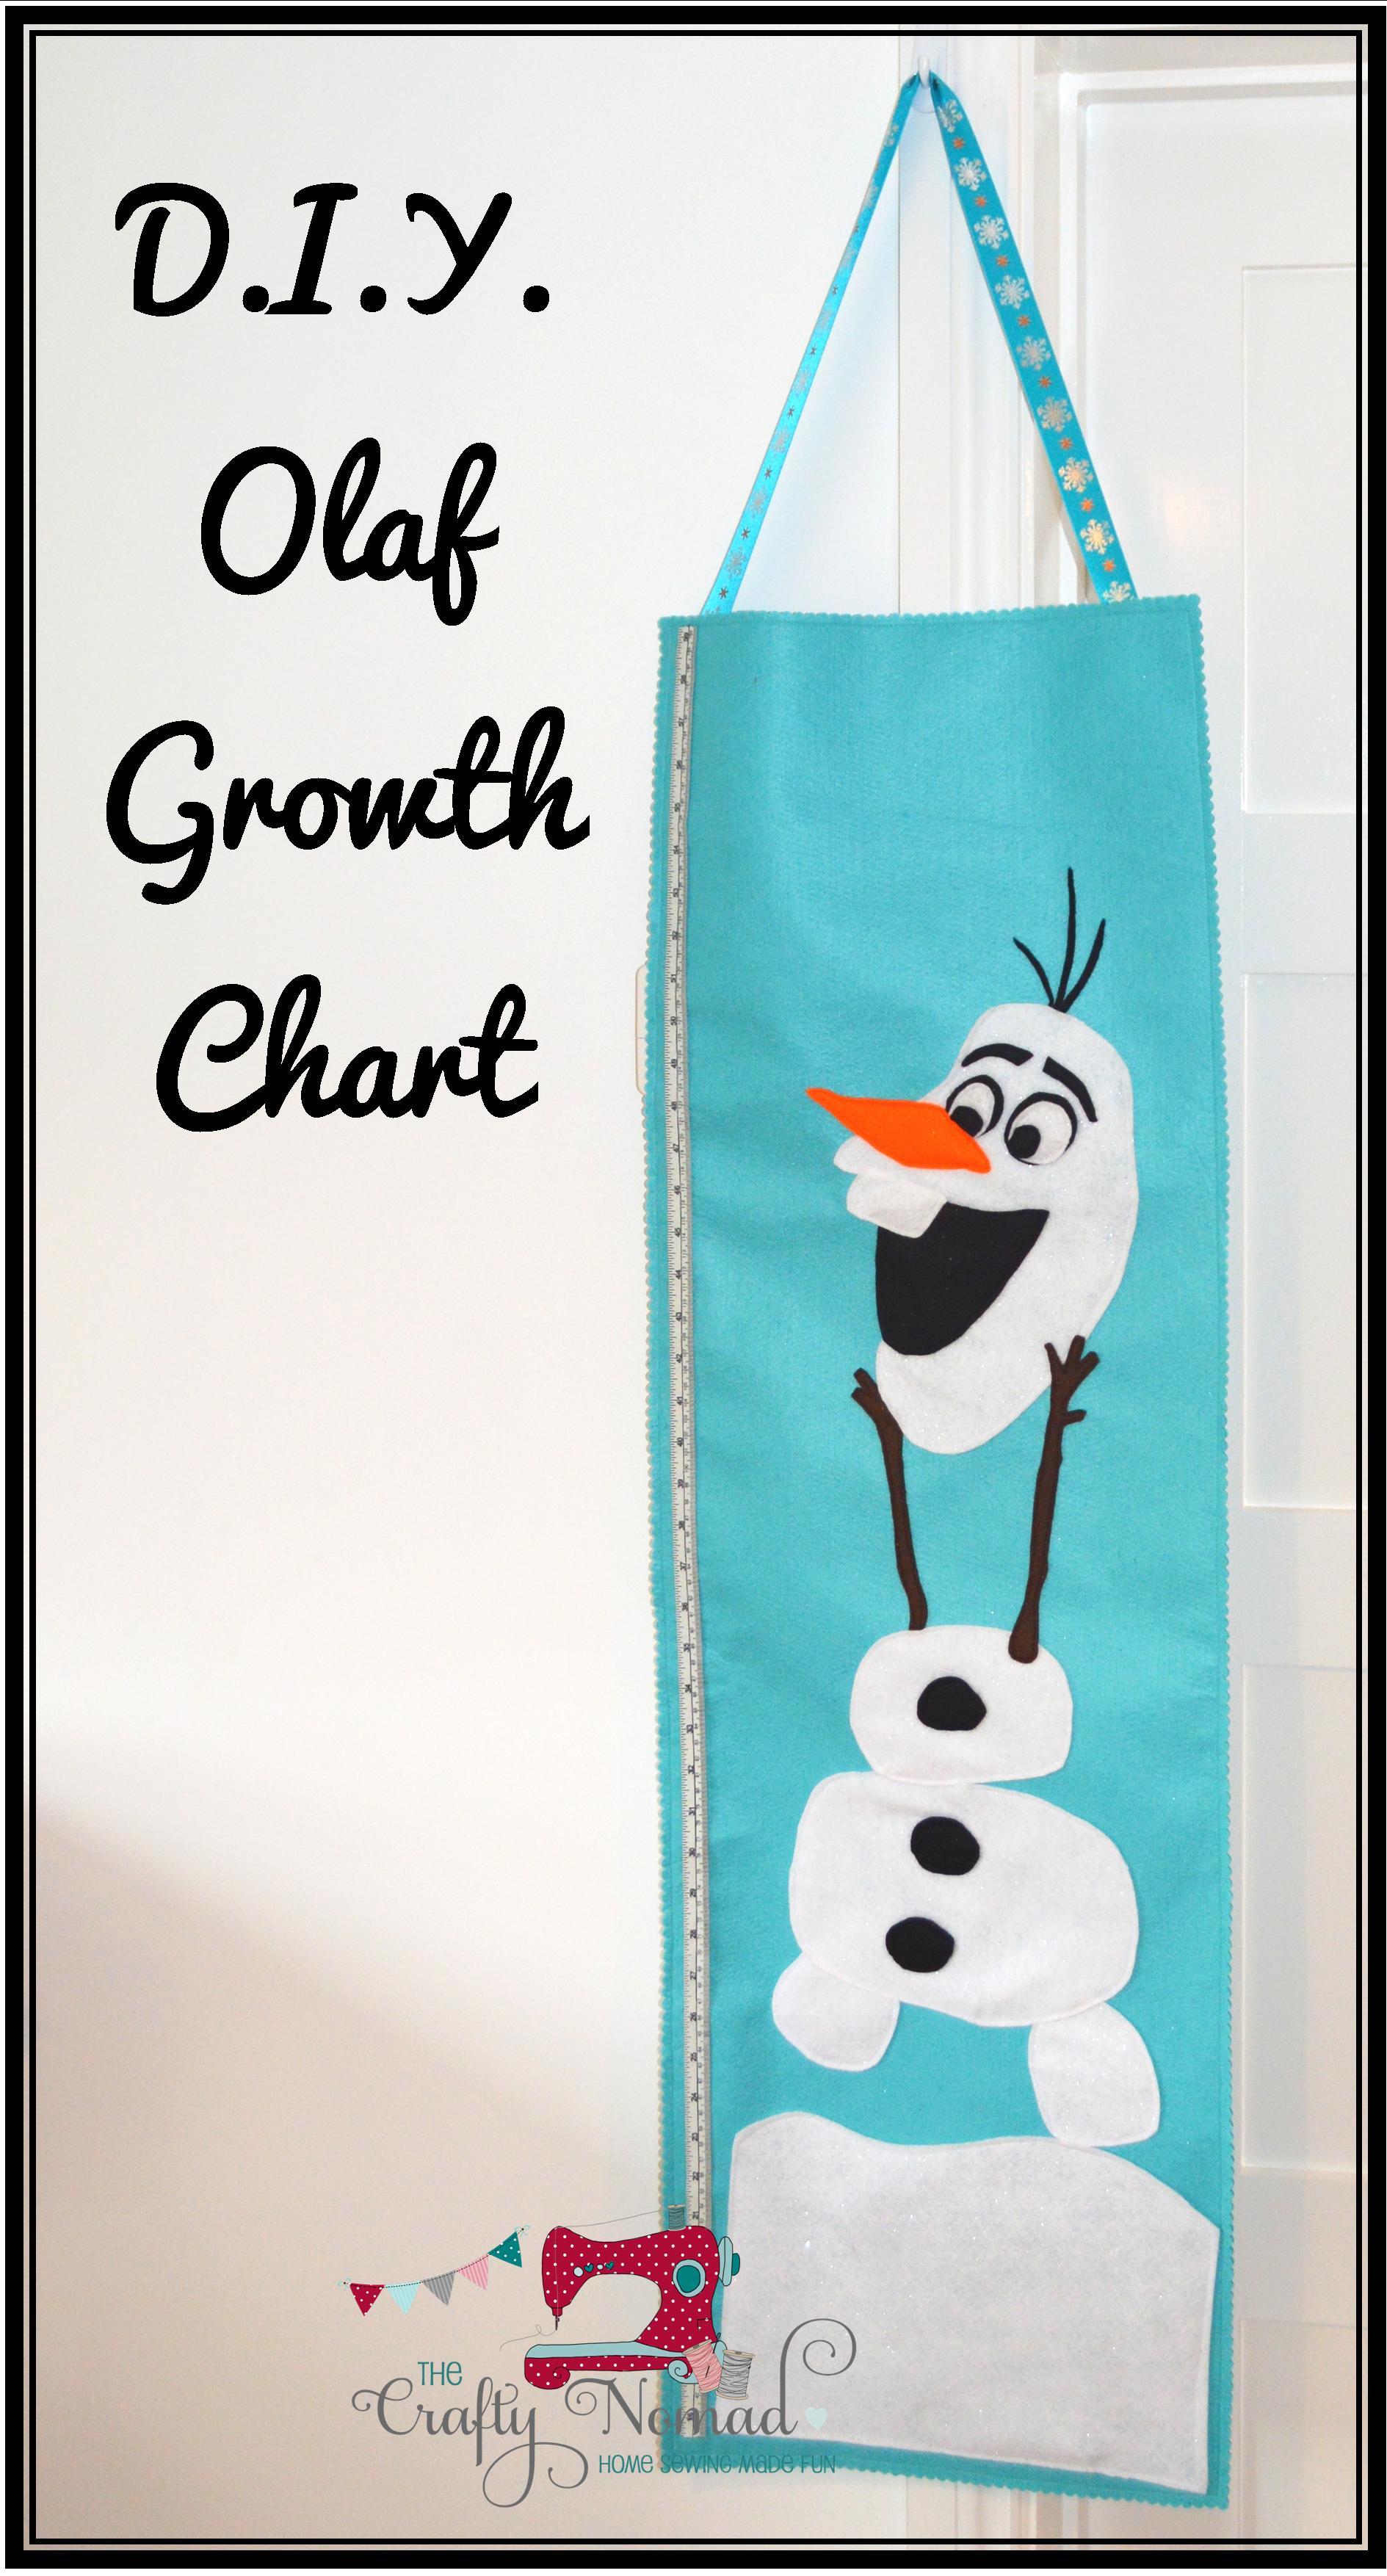 Olaf Growth Chart